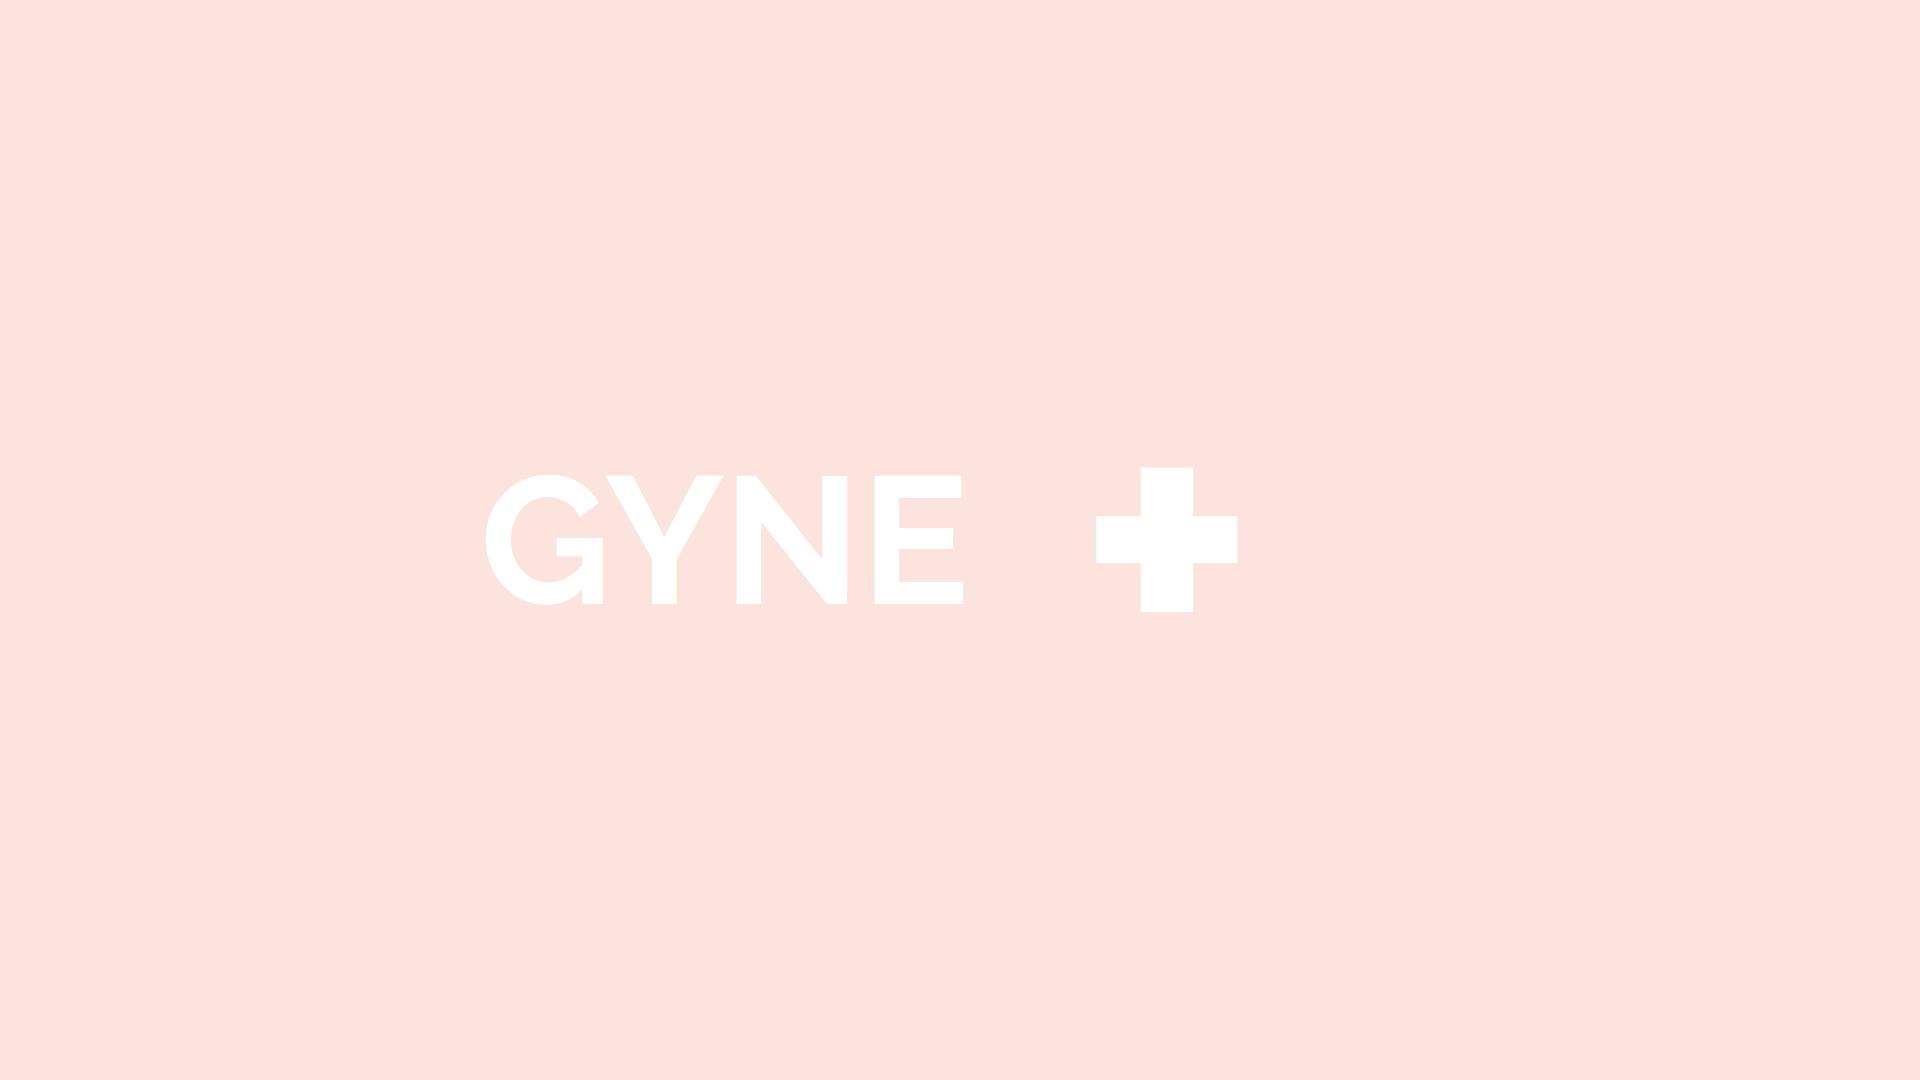 gynelogopluscros